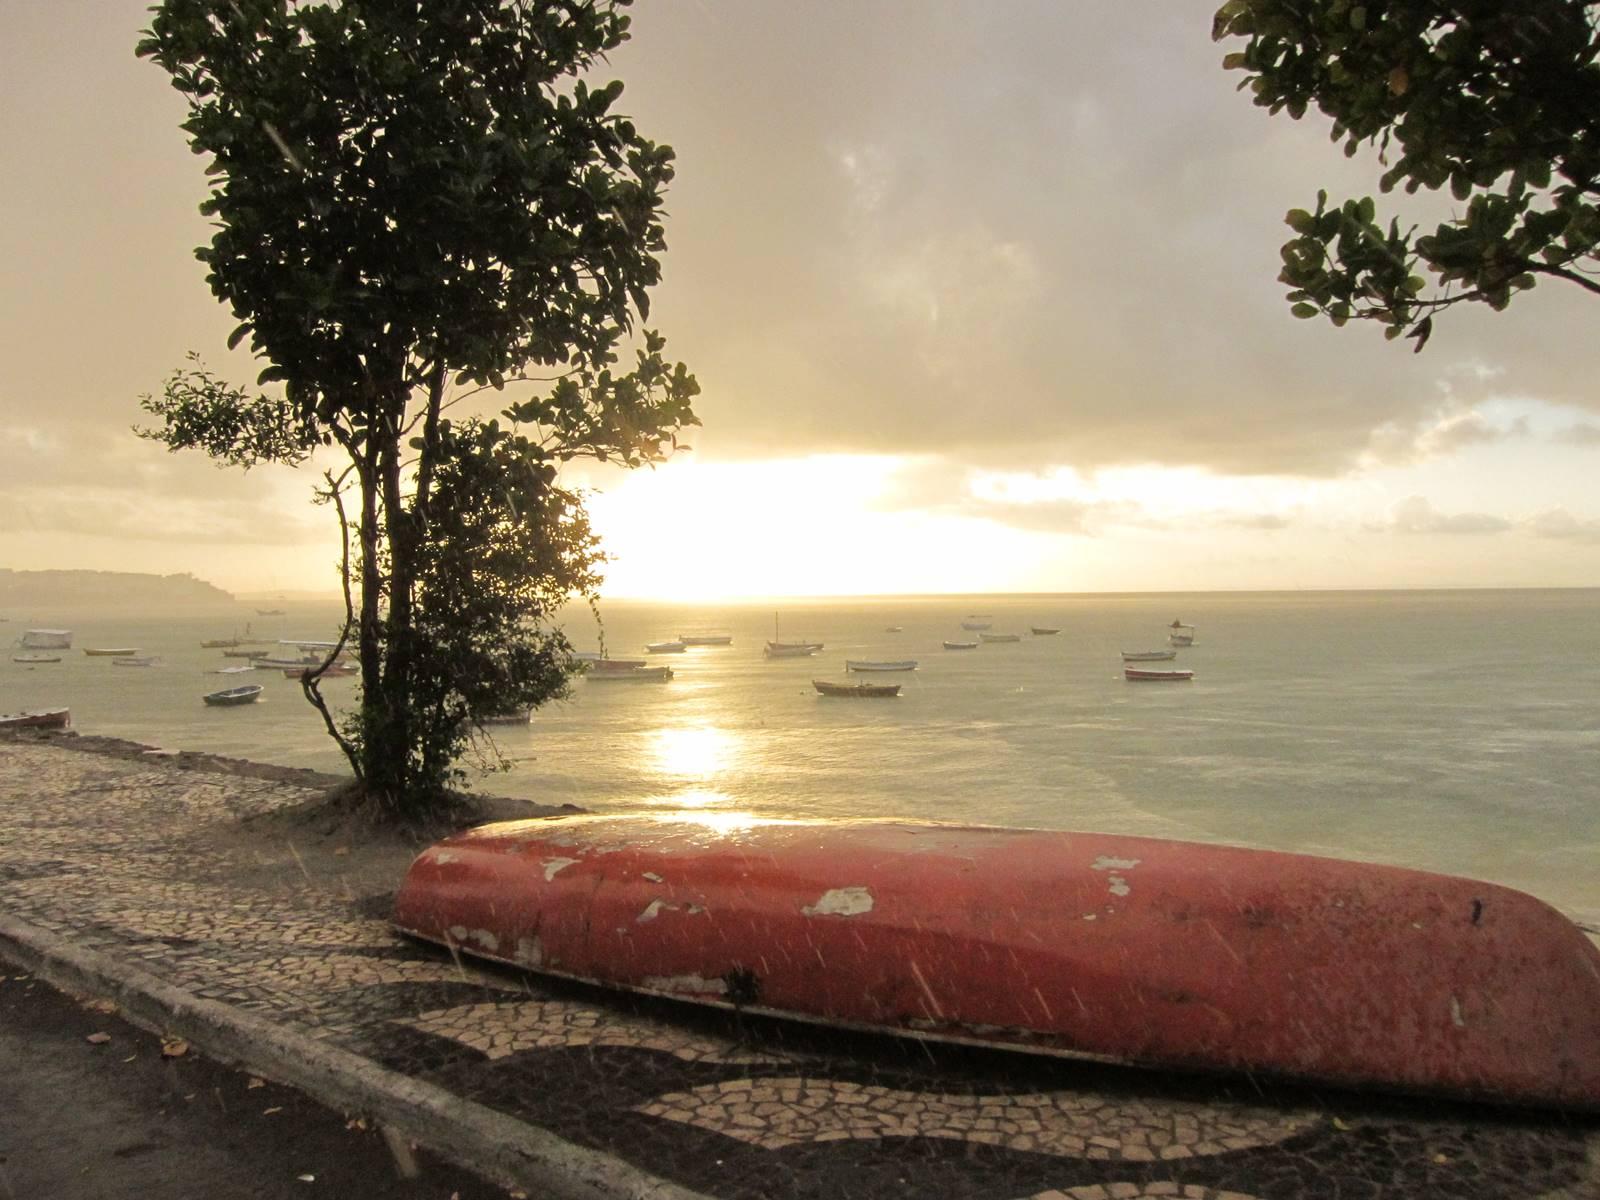 Salvador de Bahia pluie tropicale (4)